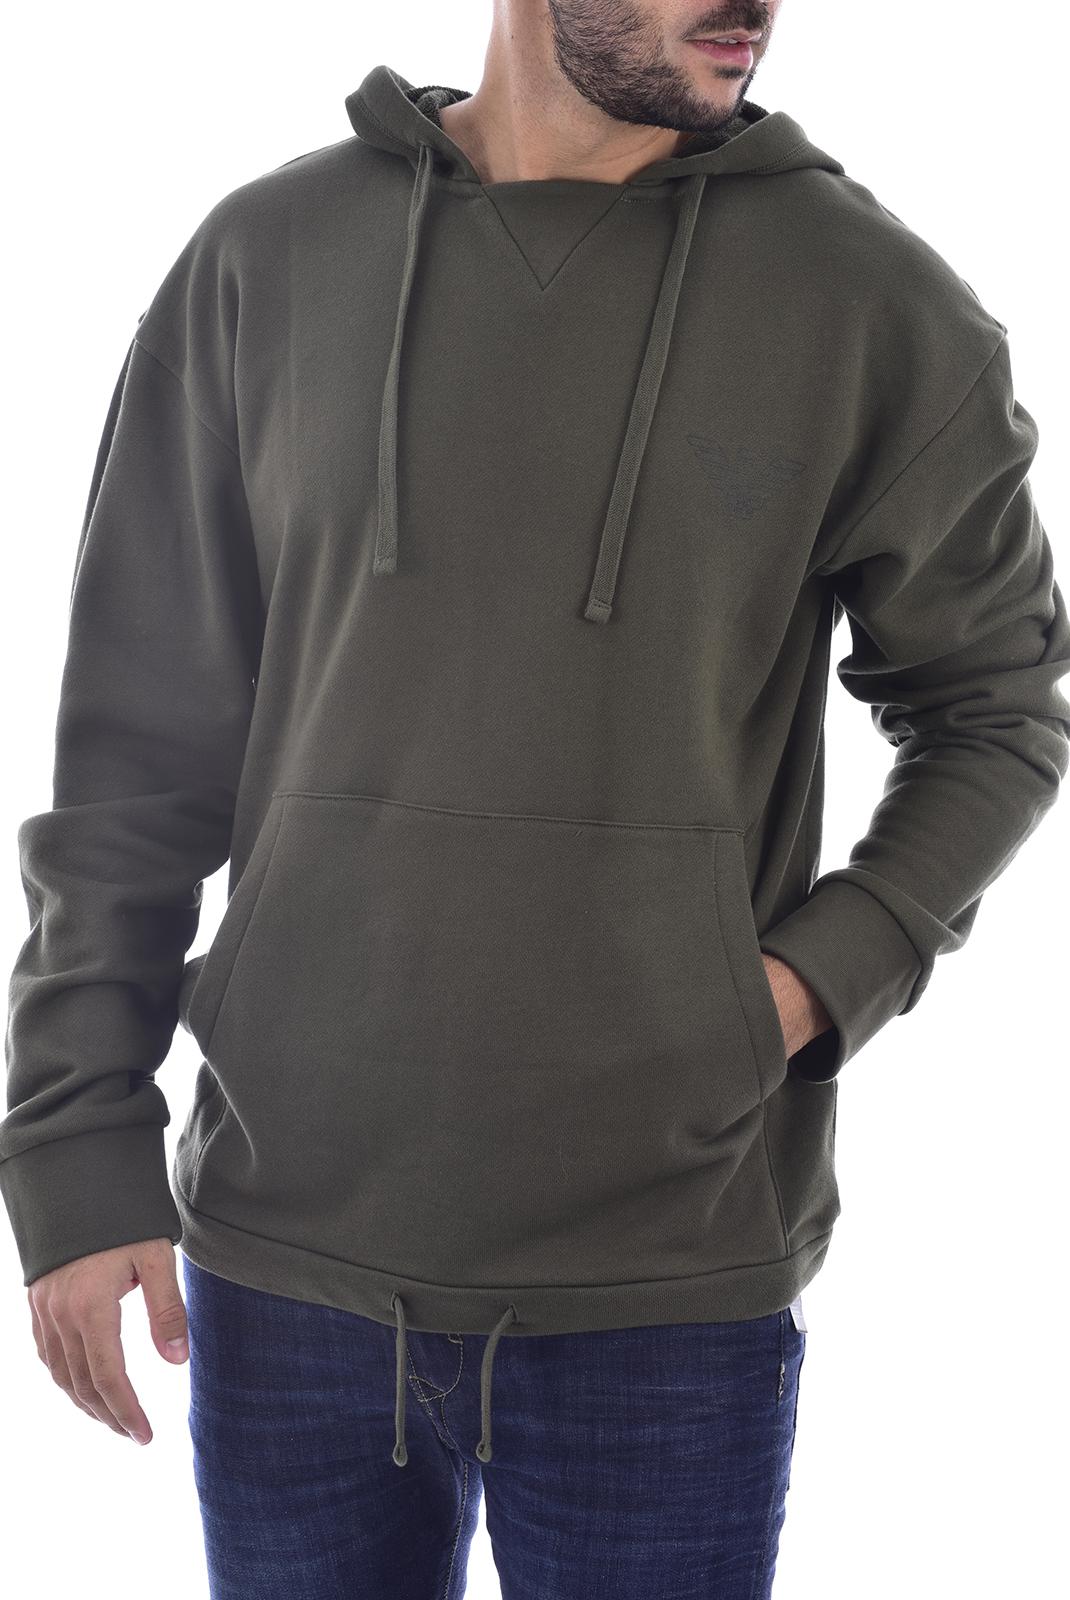 Sweatshirts  Emporio armani 111914 0A560 7581 kaki